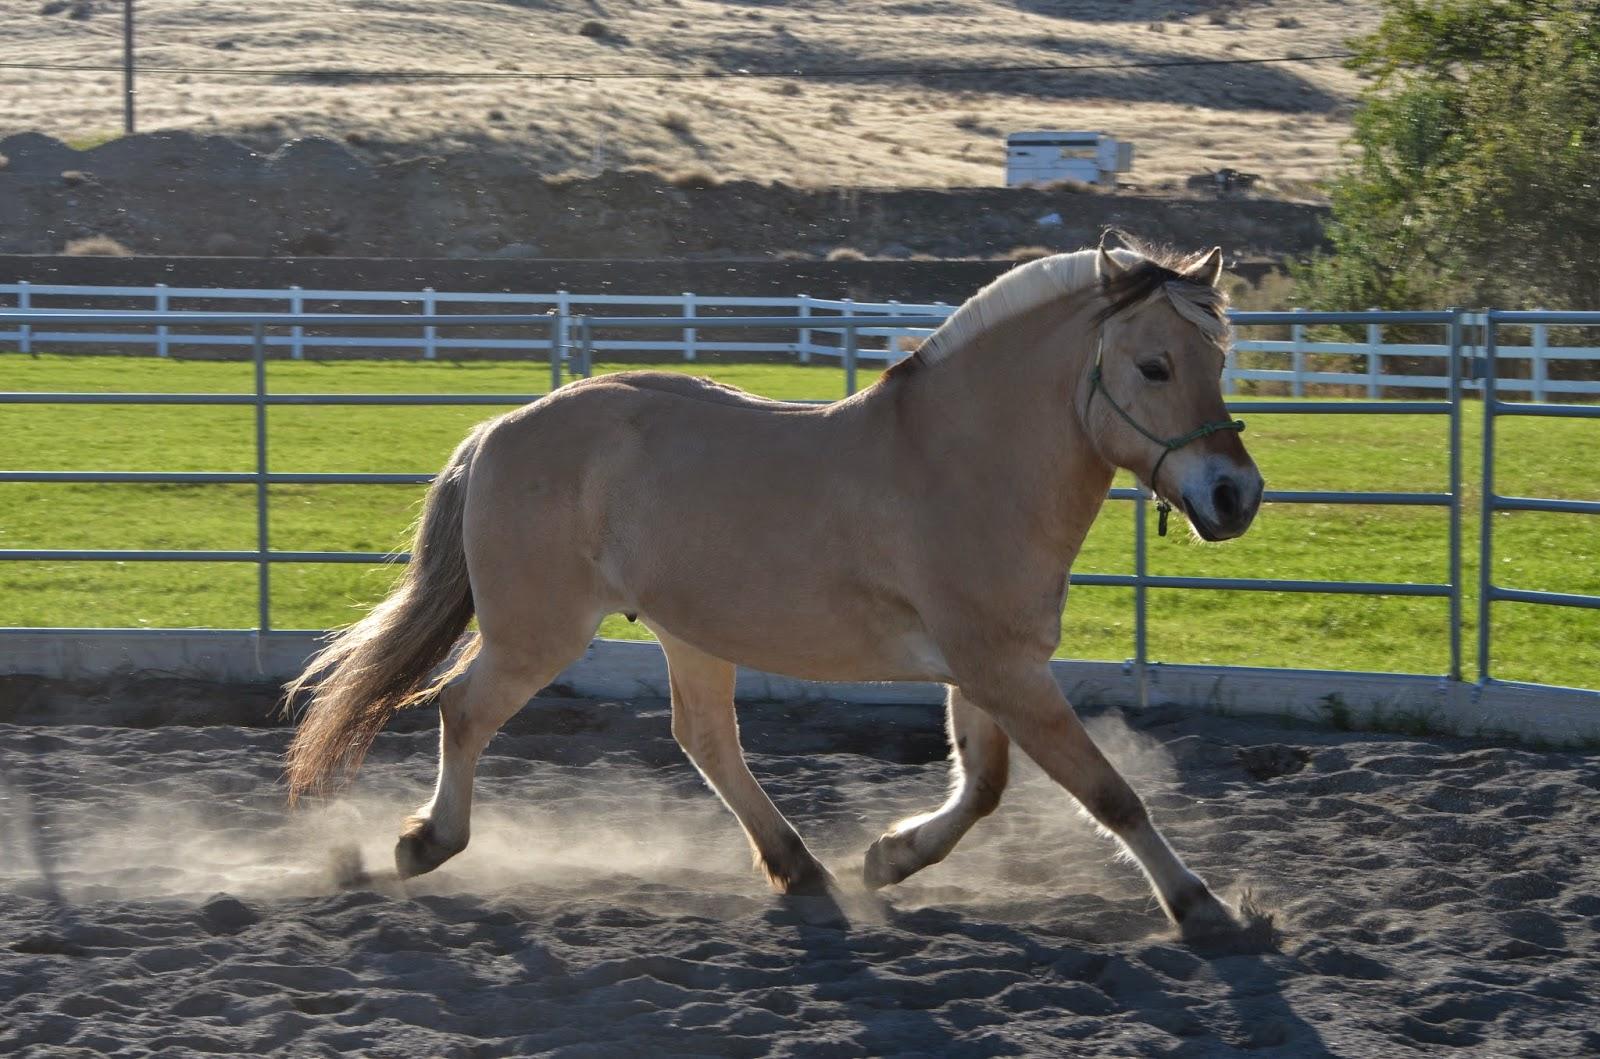 Horse extended trot